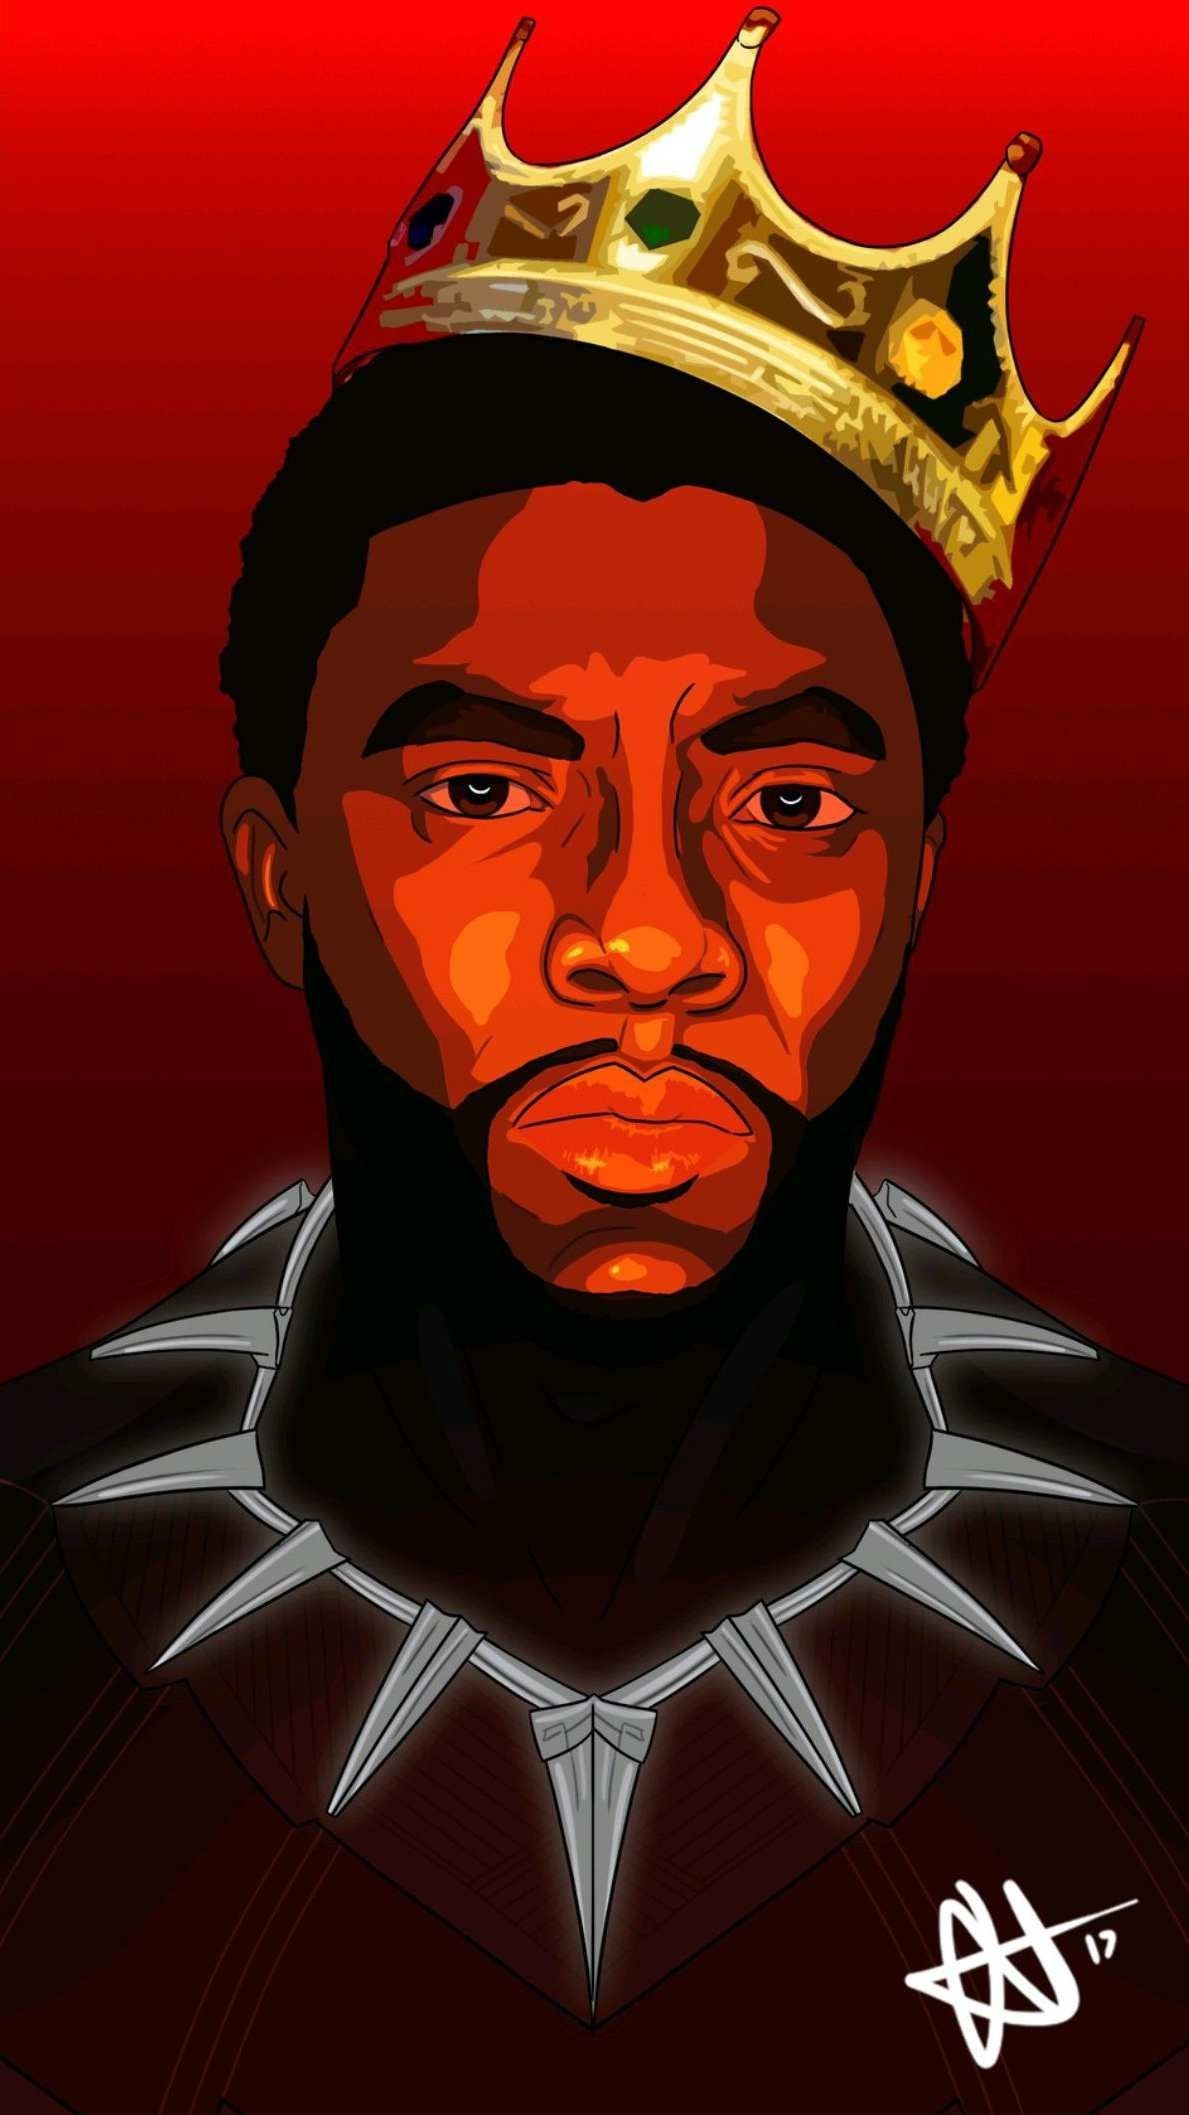 1189x2115 King Of Wakanda Black Panther Wallpaper In 2020 Panther Art Black Panther Art Black Artwork